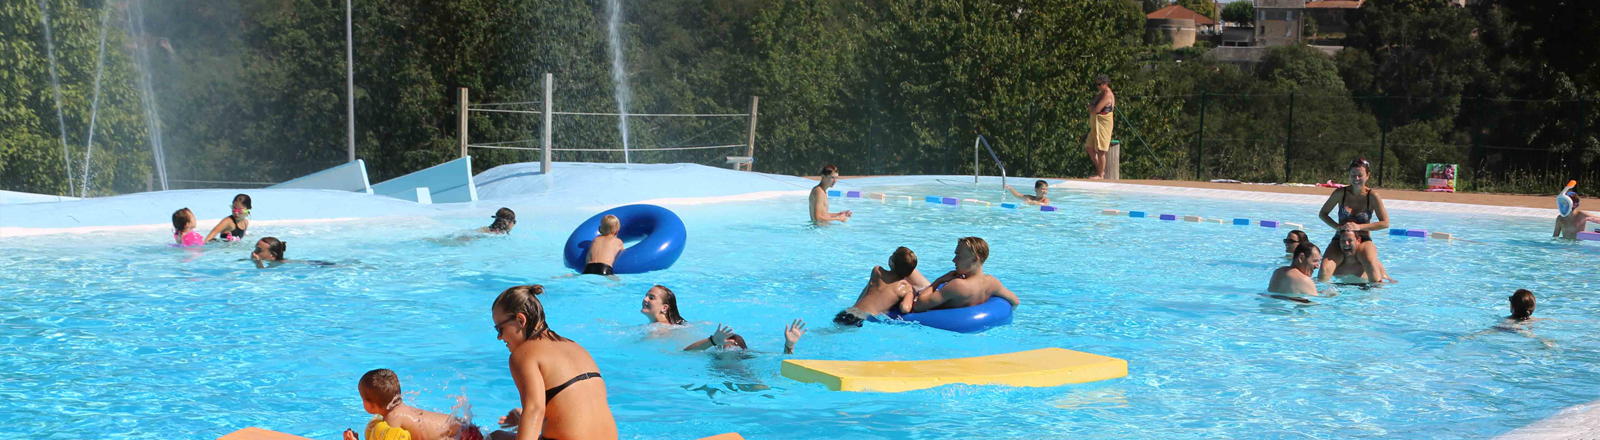 camping-deux-sevres-avec-piscine-bonnes-vacances-sarl